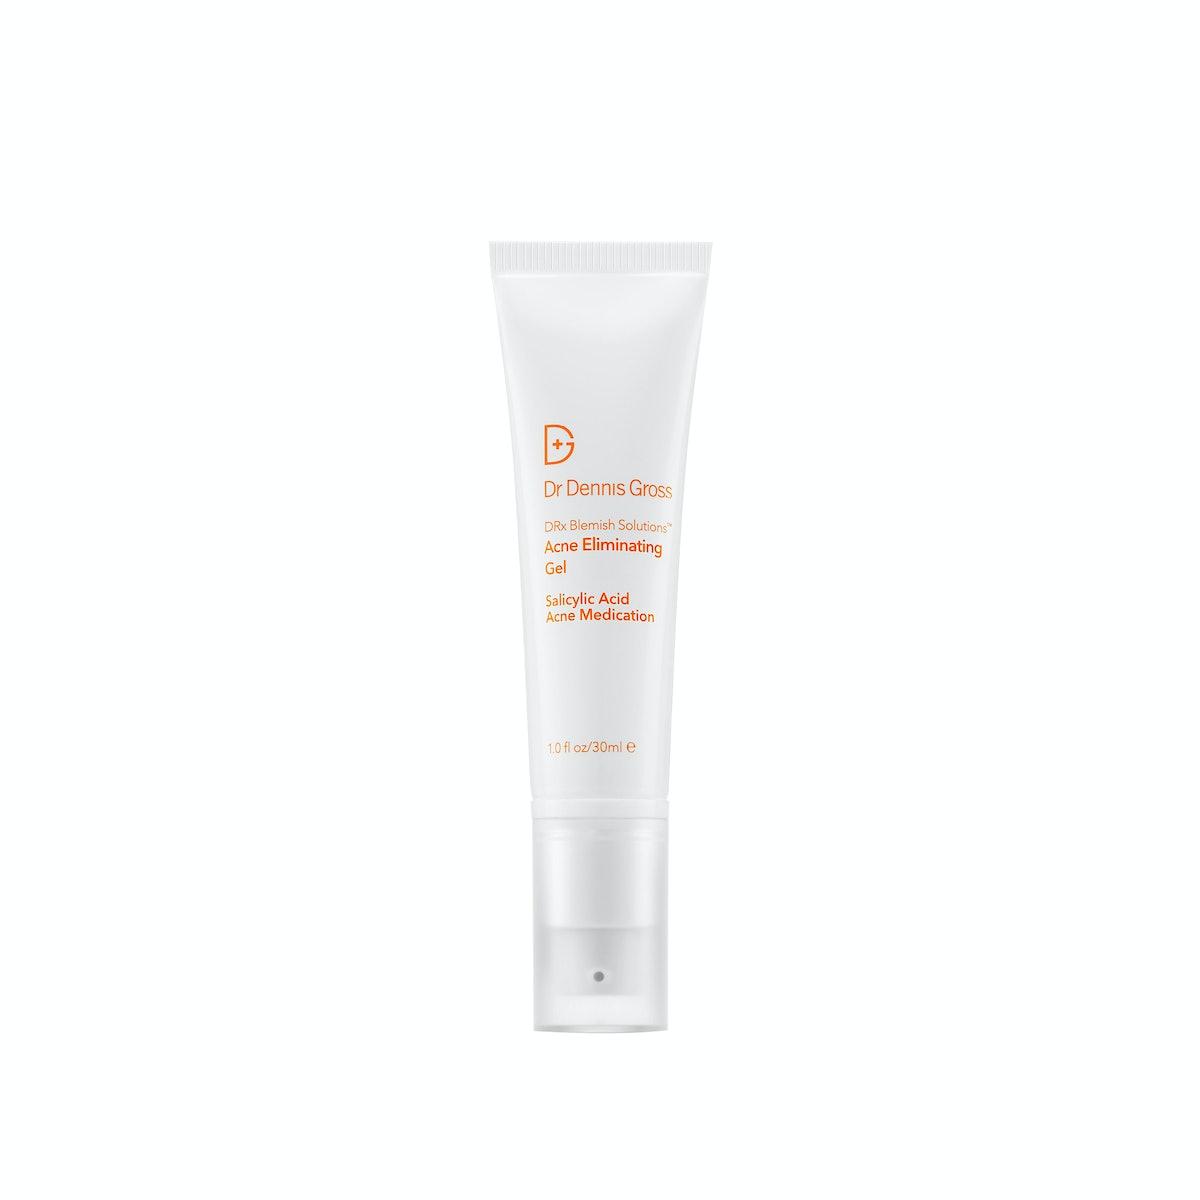 DRx Blemish Solutions Acne Eliminating Gel